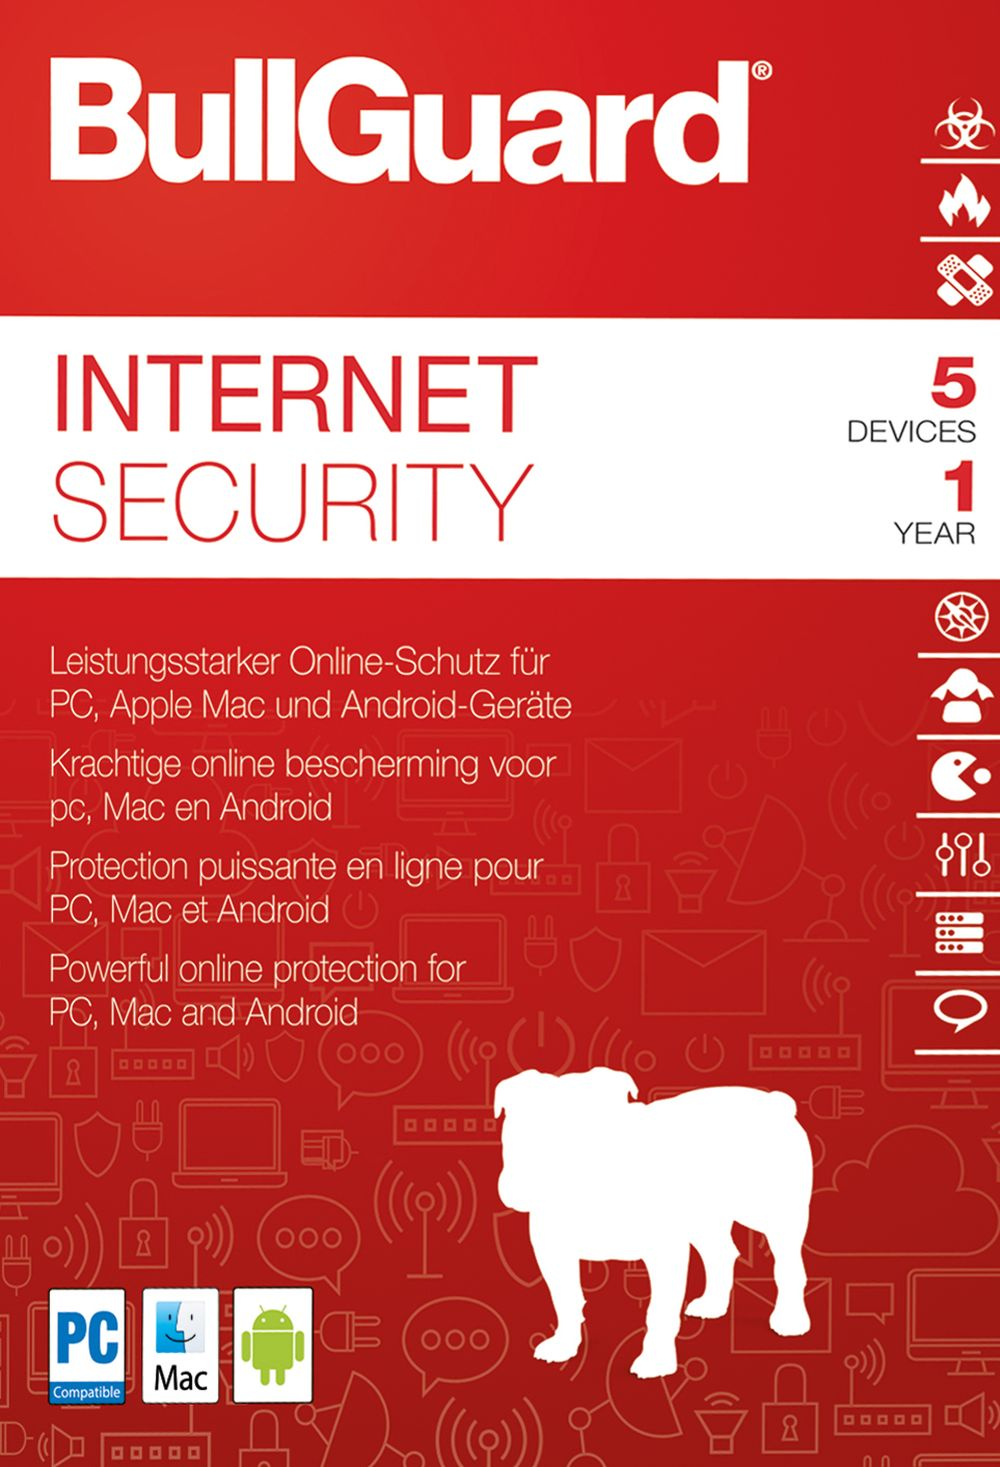 Bullguard Internet Security 2018 - 1 Jahr 5 Geräte